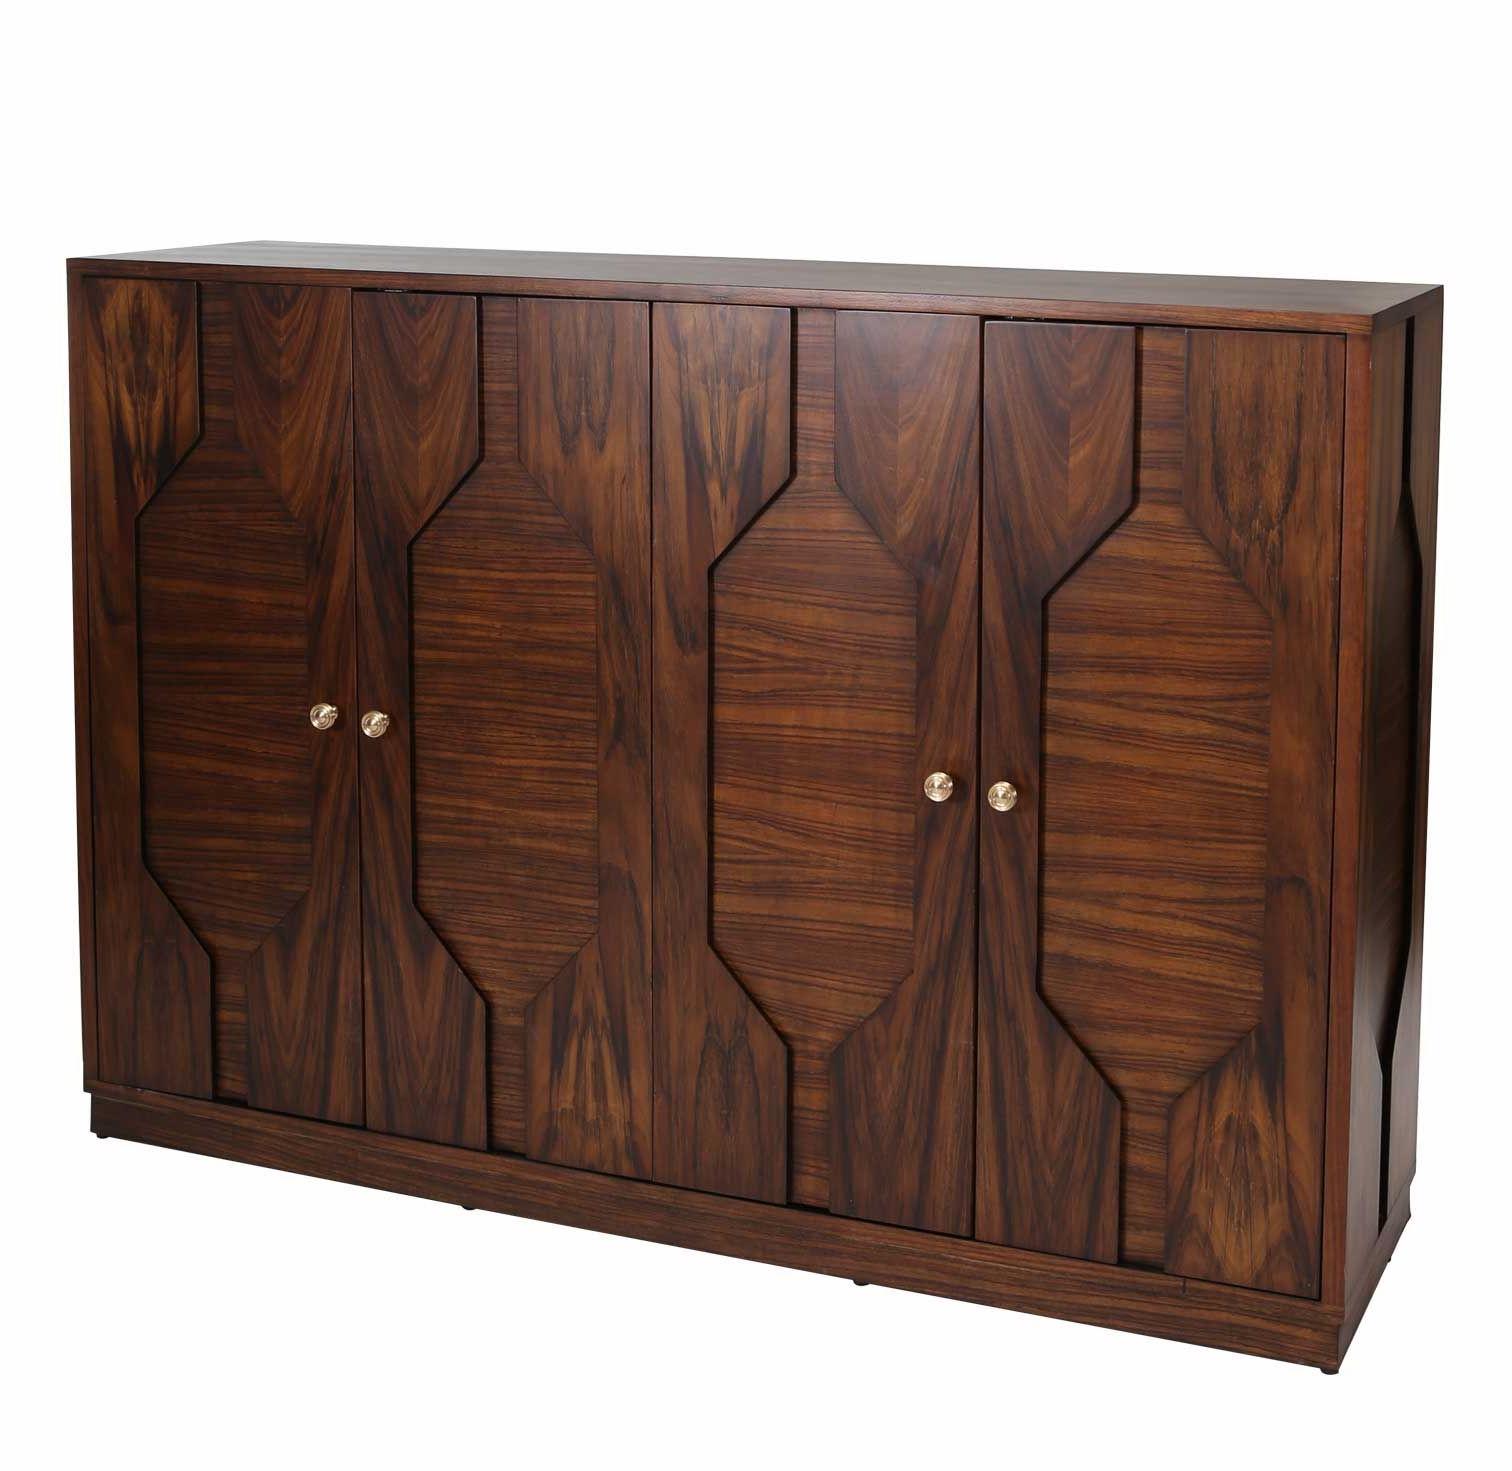 "Palisade 68"" Sideboard, Brown/gold Hooker Furniture One Inside Palisade Sideboards (View 11 of 20)"